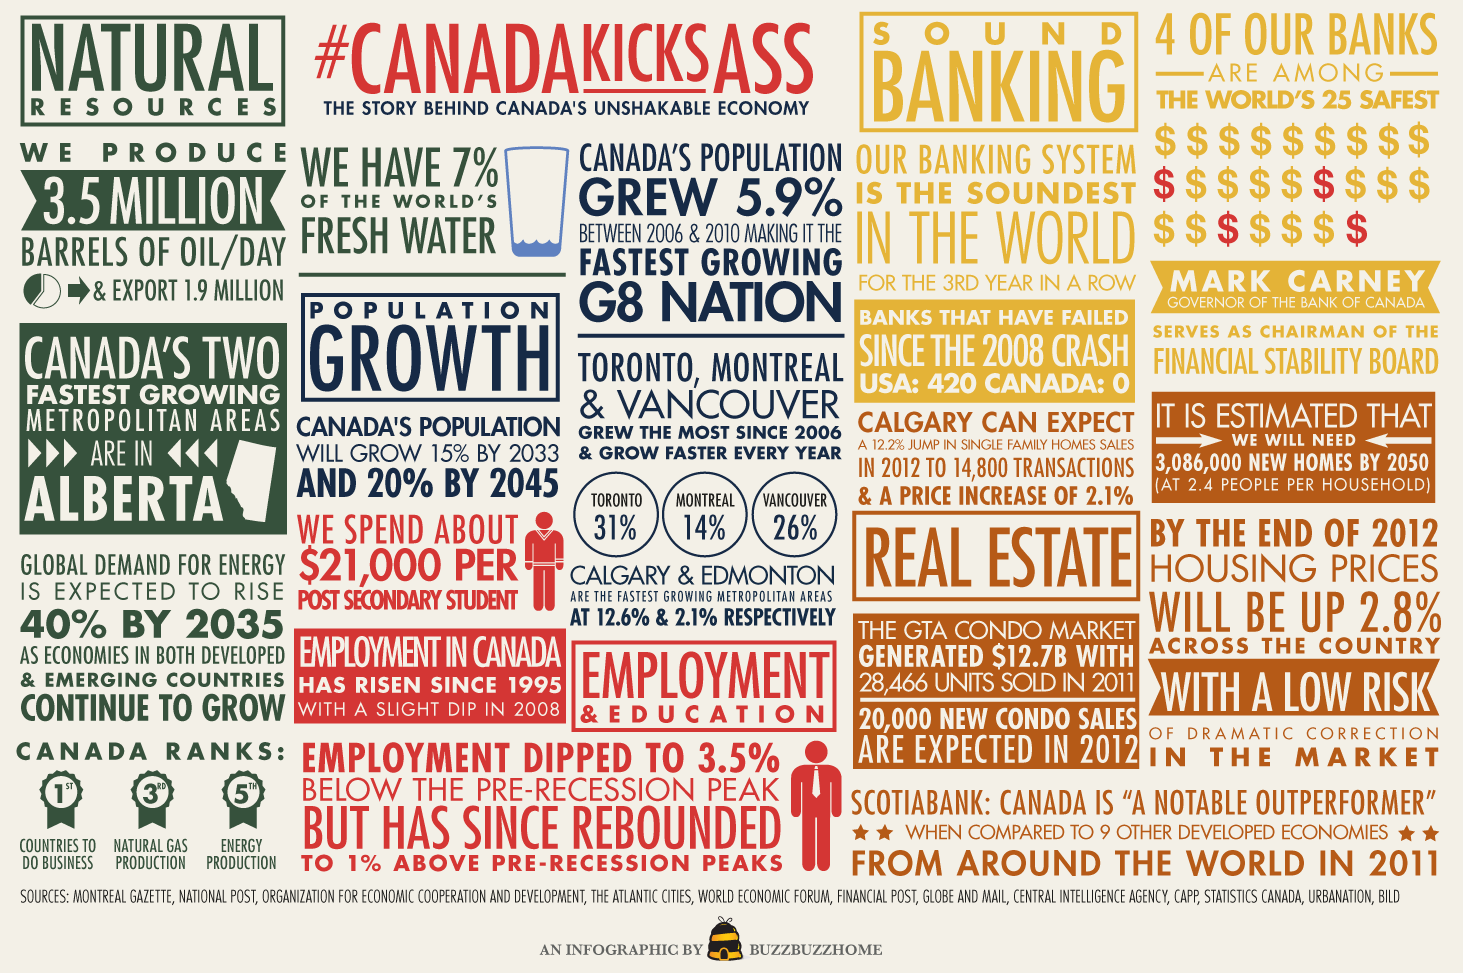 Canada Kicks Ass Infographic1